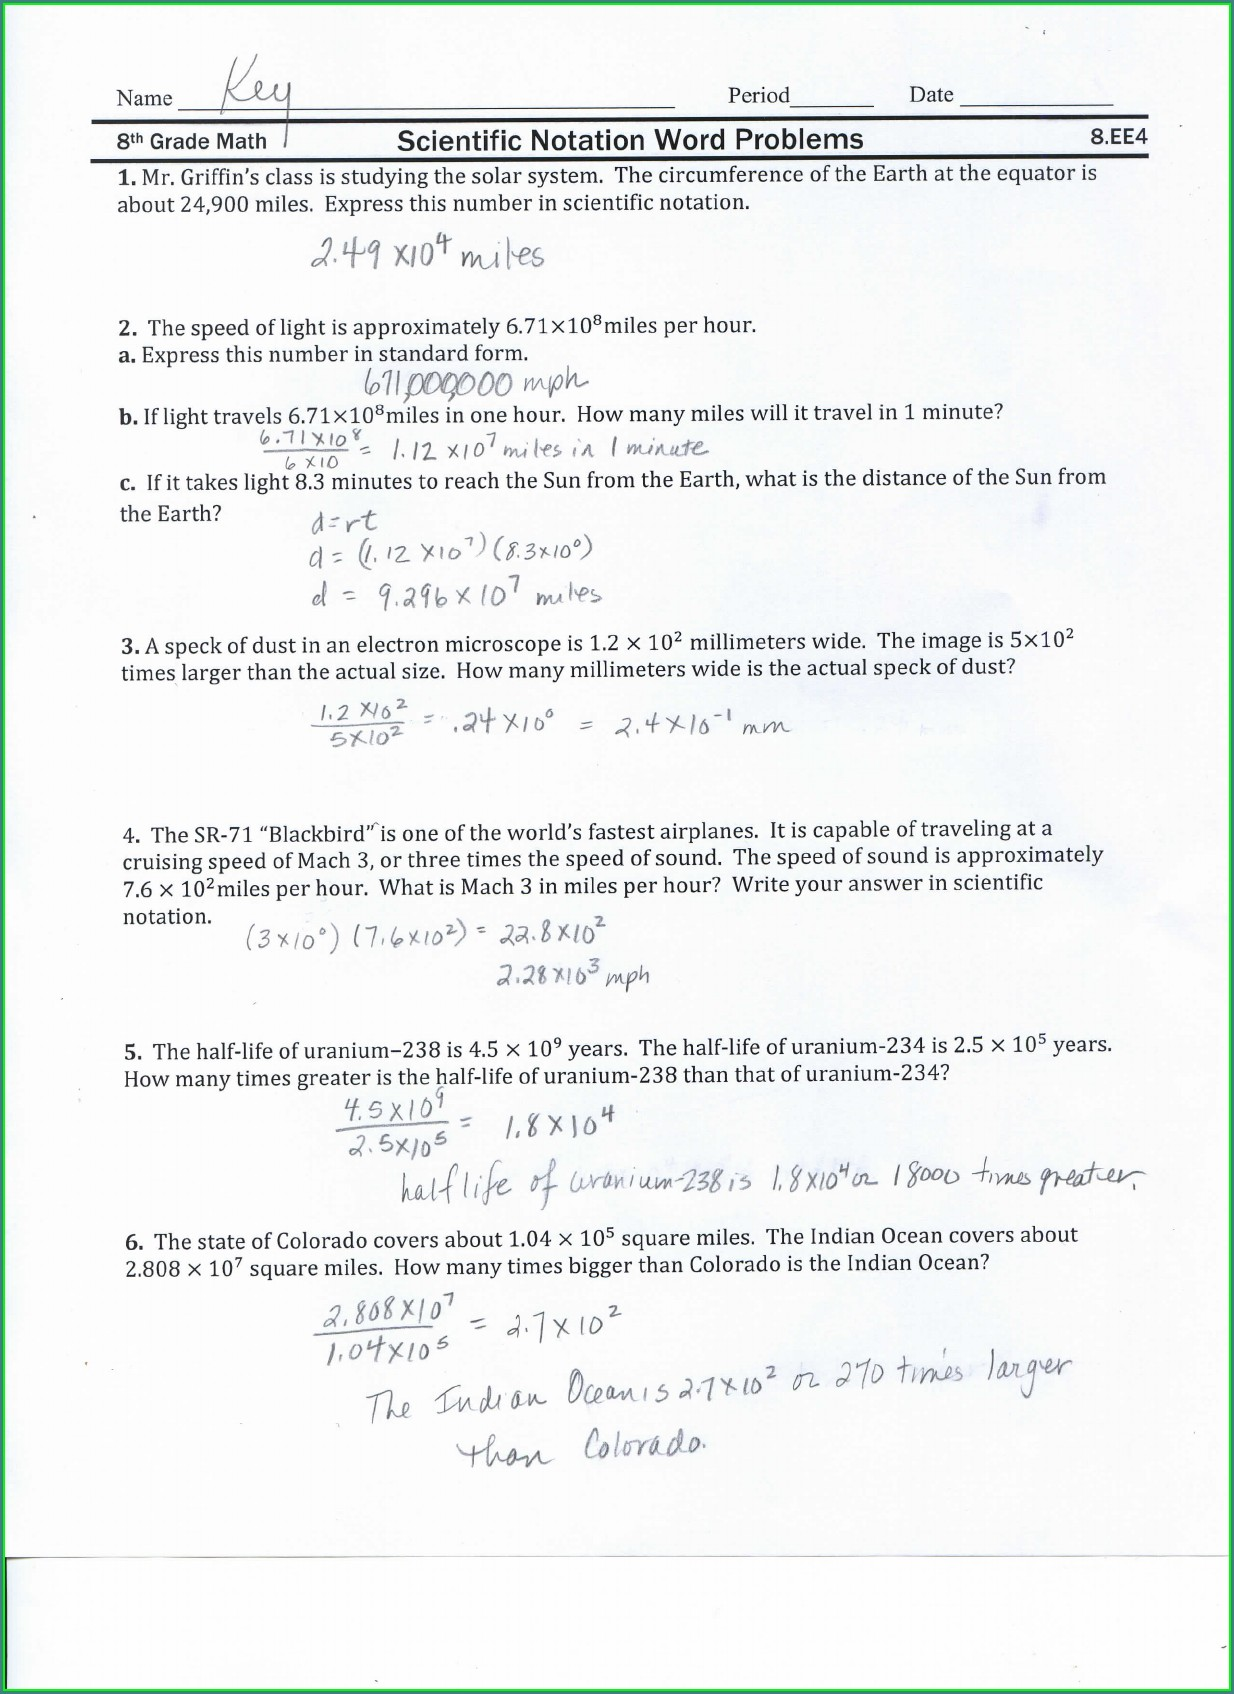 Function Notation Word Problems Worksheet Pdf